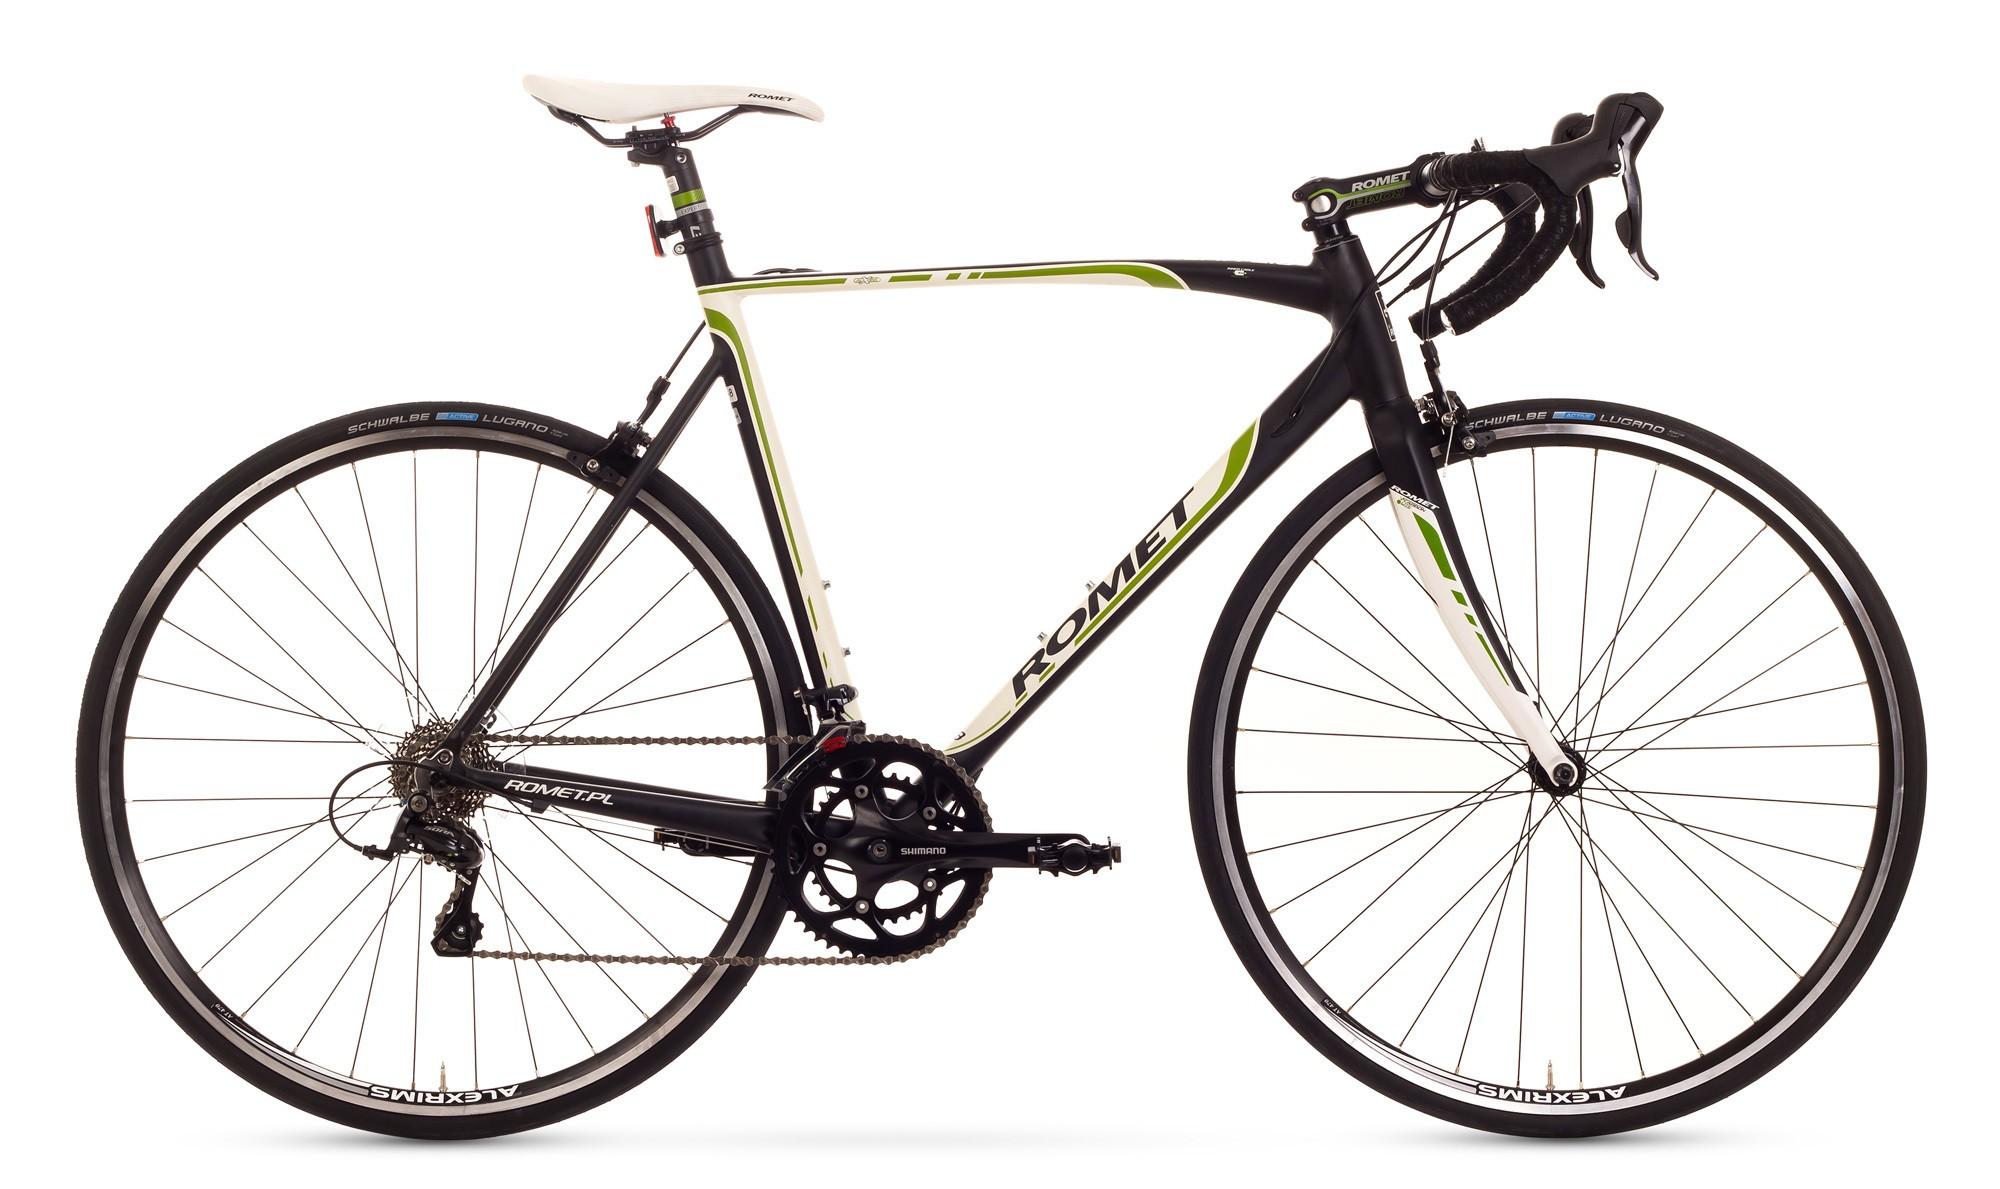 Bicicleta cursiera Romet Huragan 2.0 - alb-negru-verde